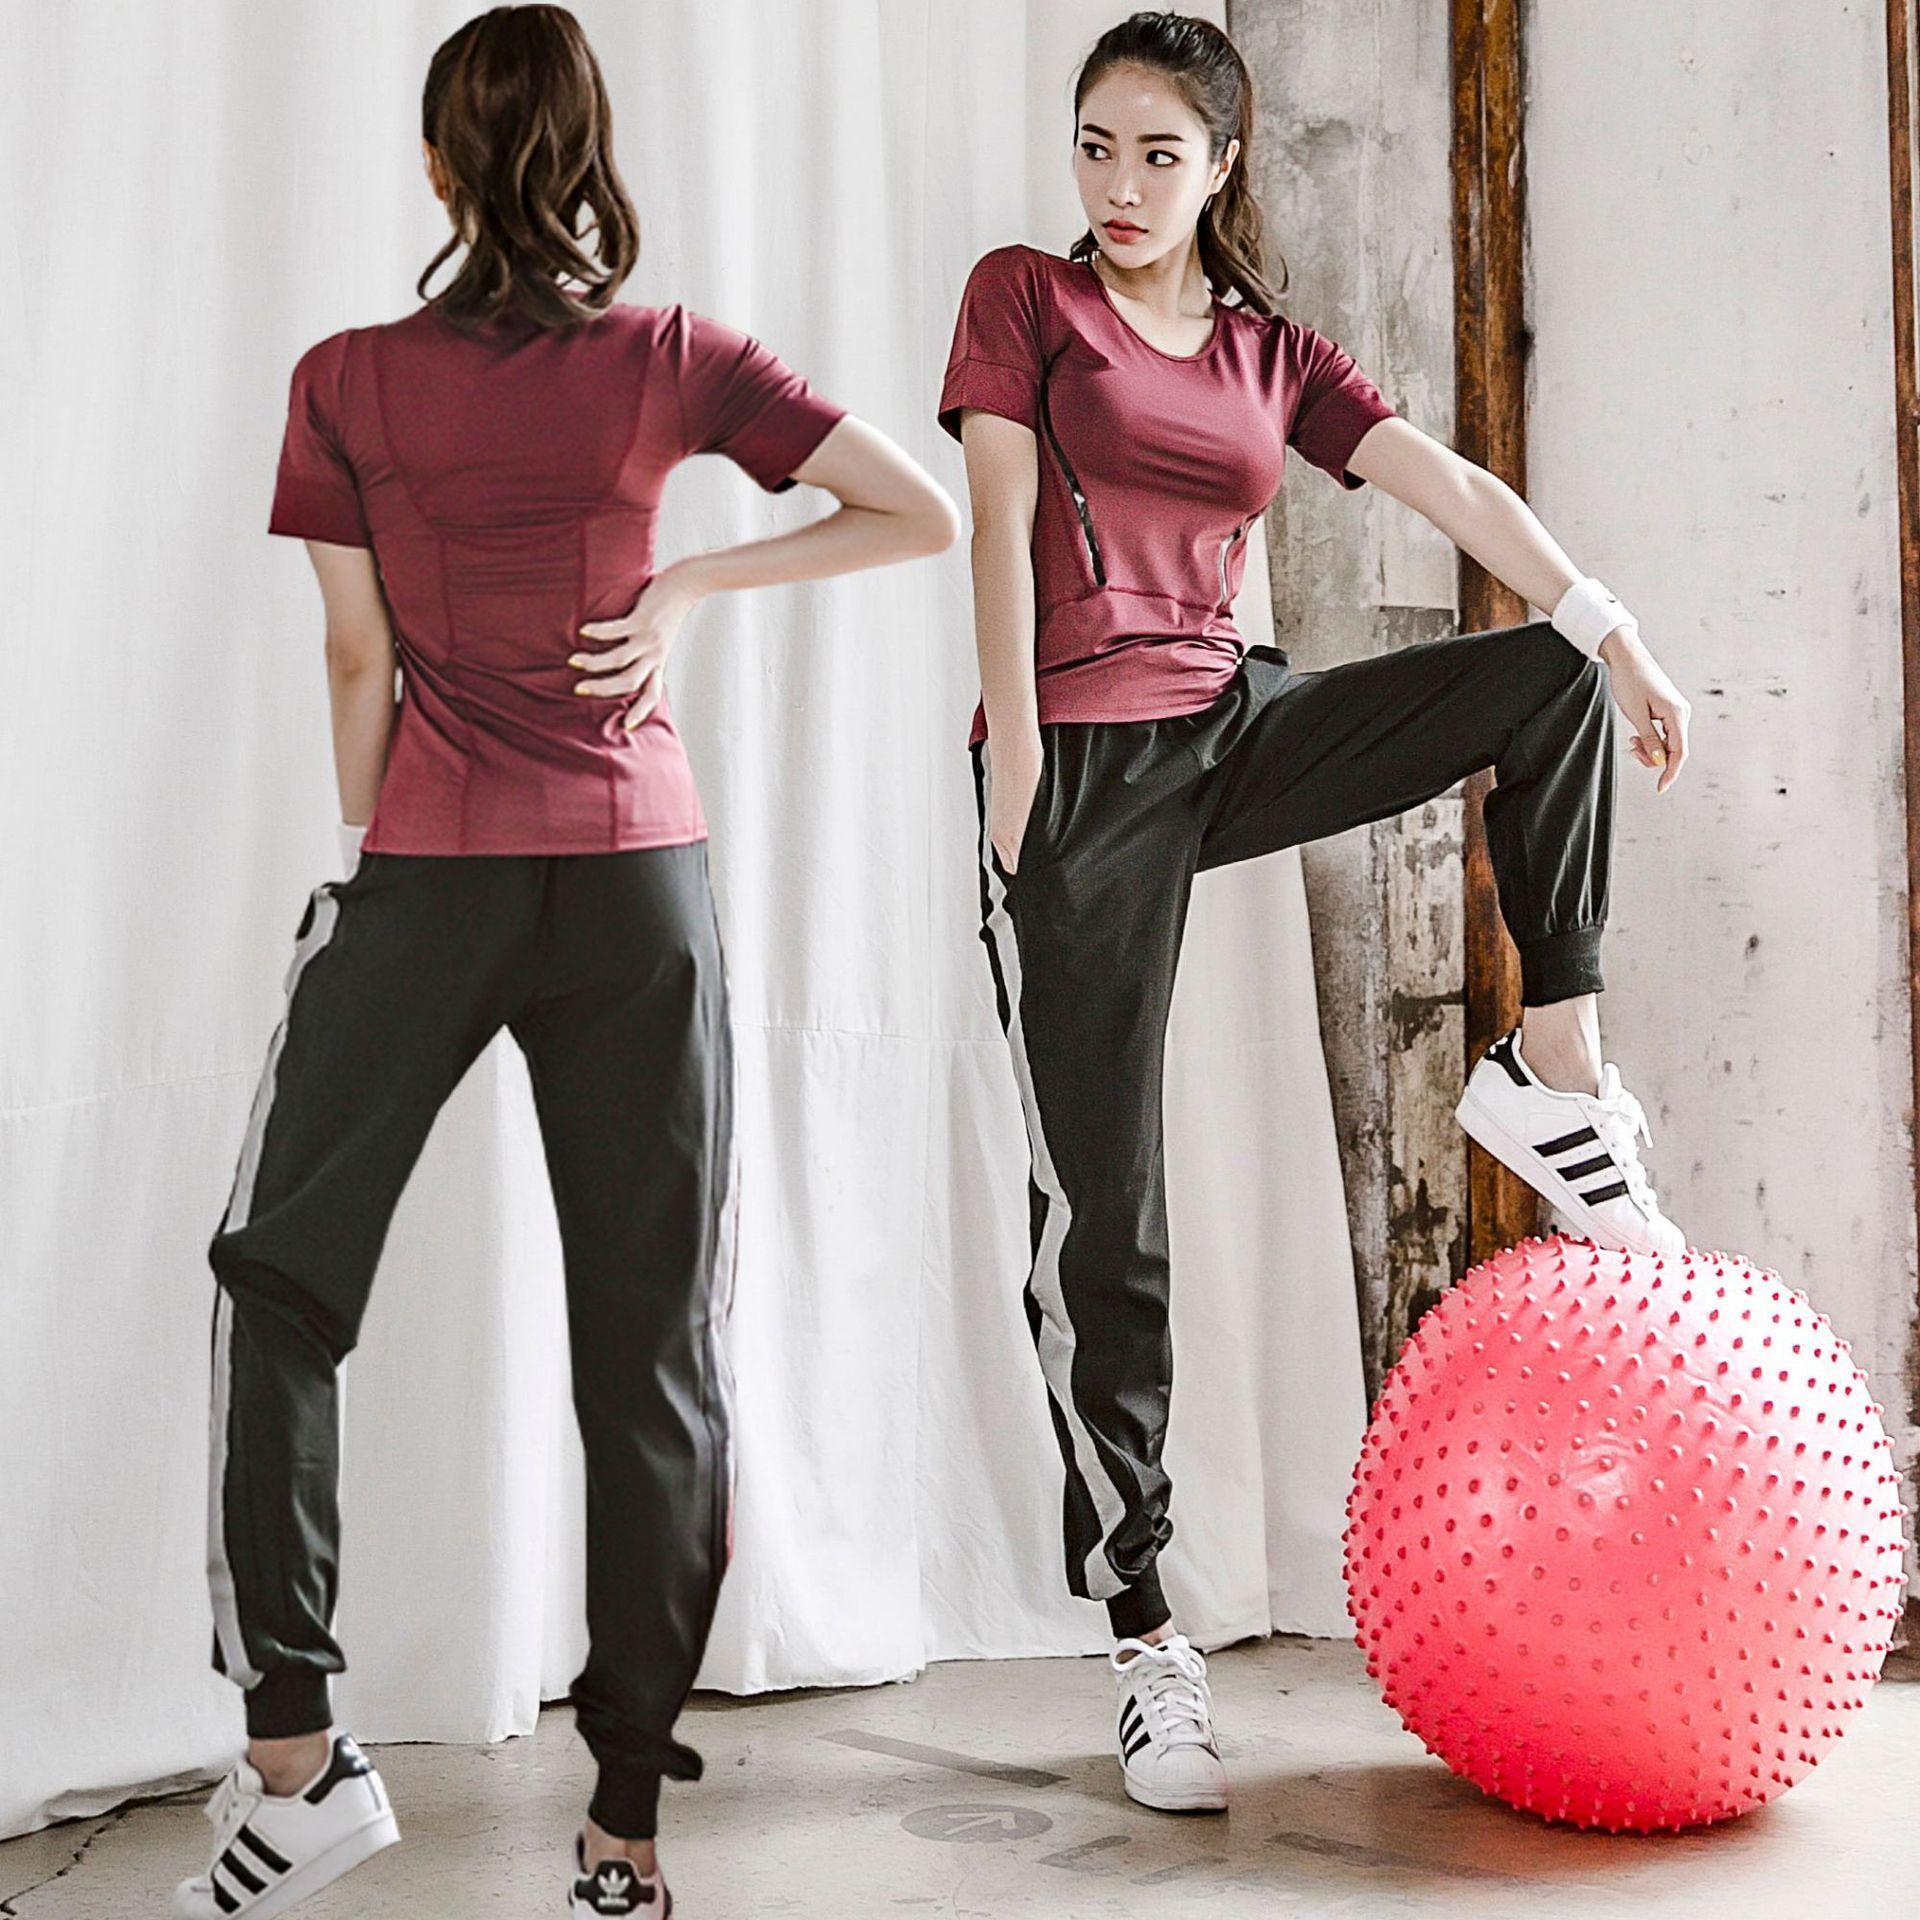 2020 neues professionelle Yoga-Anzug Anzug Sport-Fitness-Kleidung Sommer loses Yoga läuft Anzug Fitness Frauen Asian Code 4 Farben